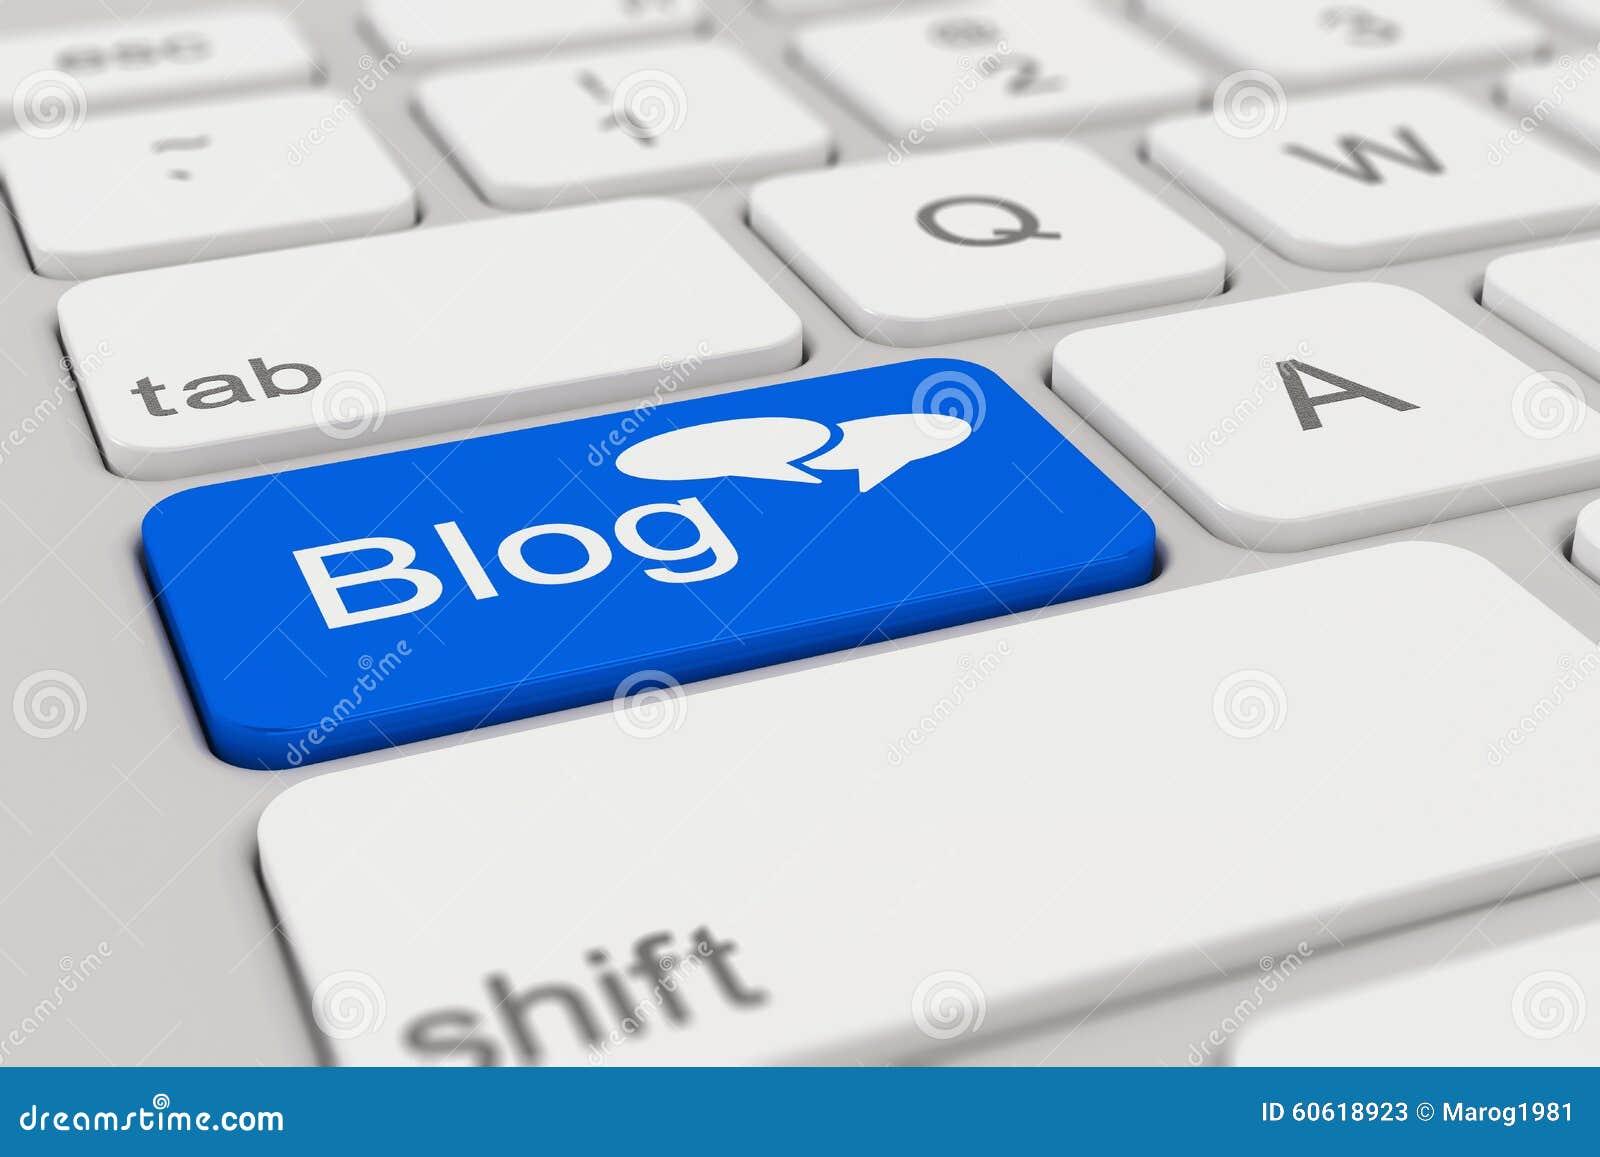 Keyboard - Blog - blue